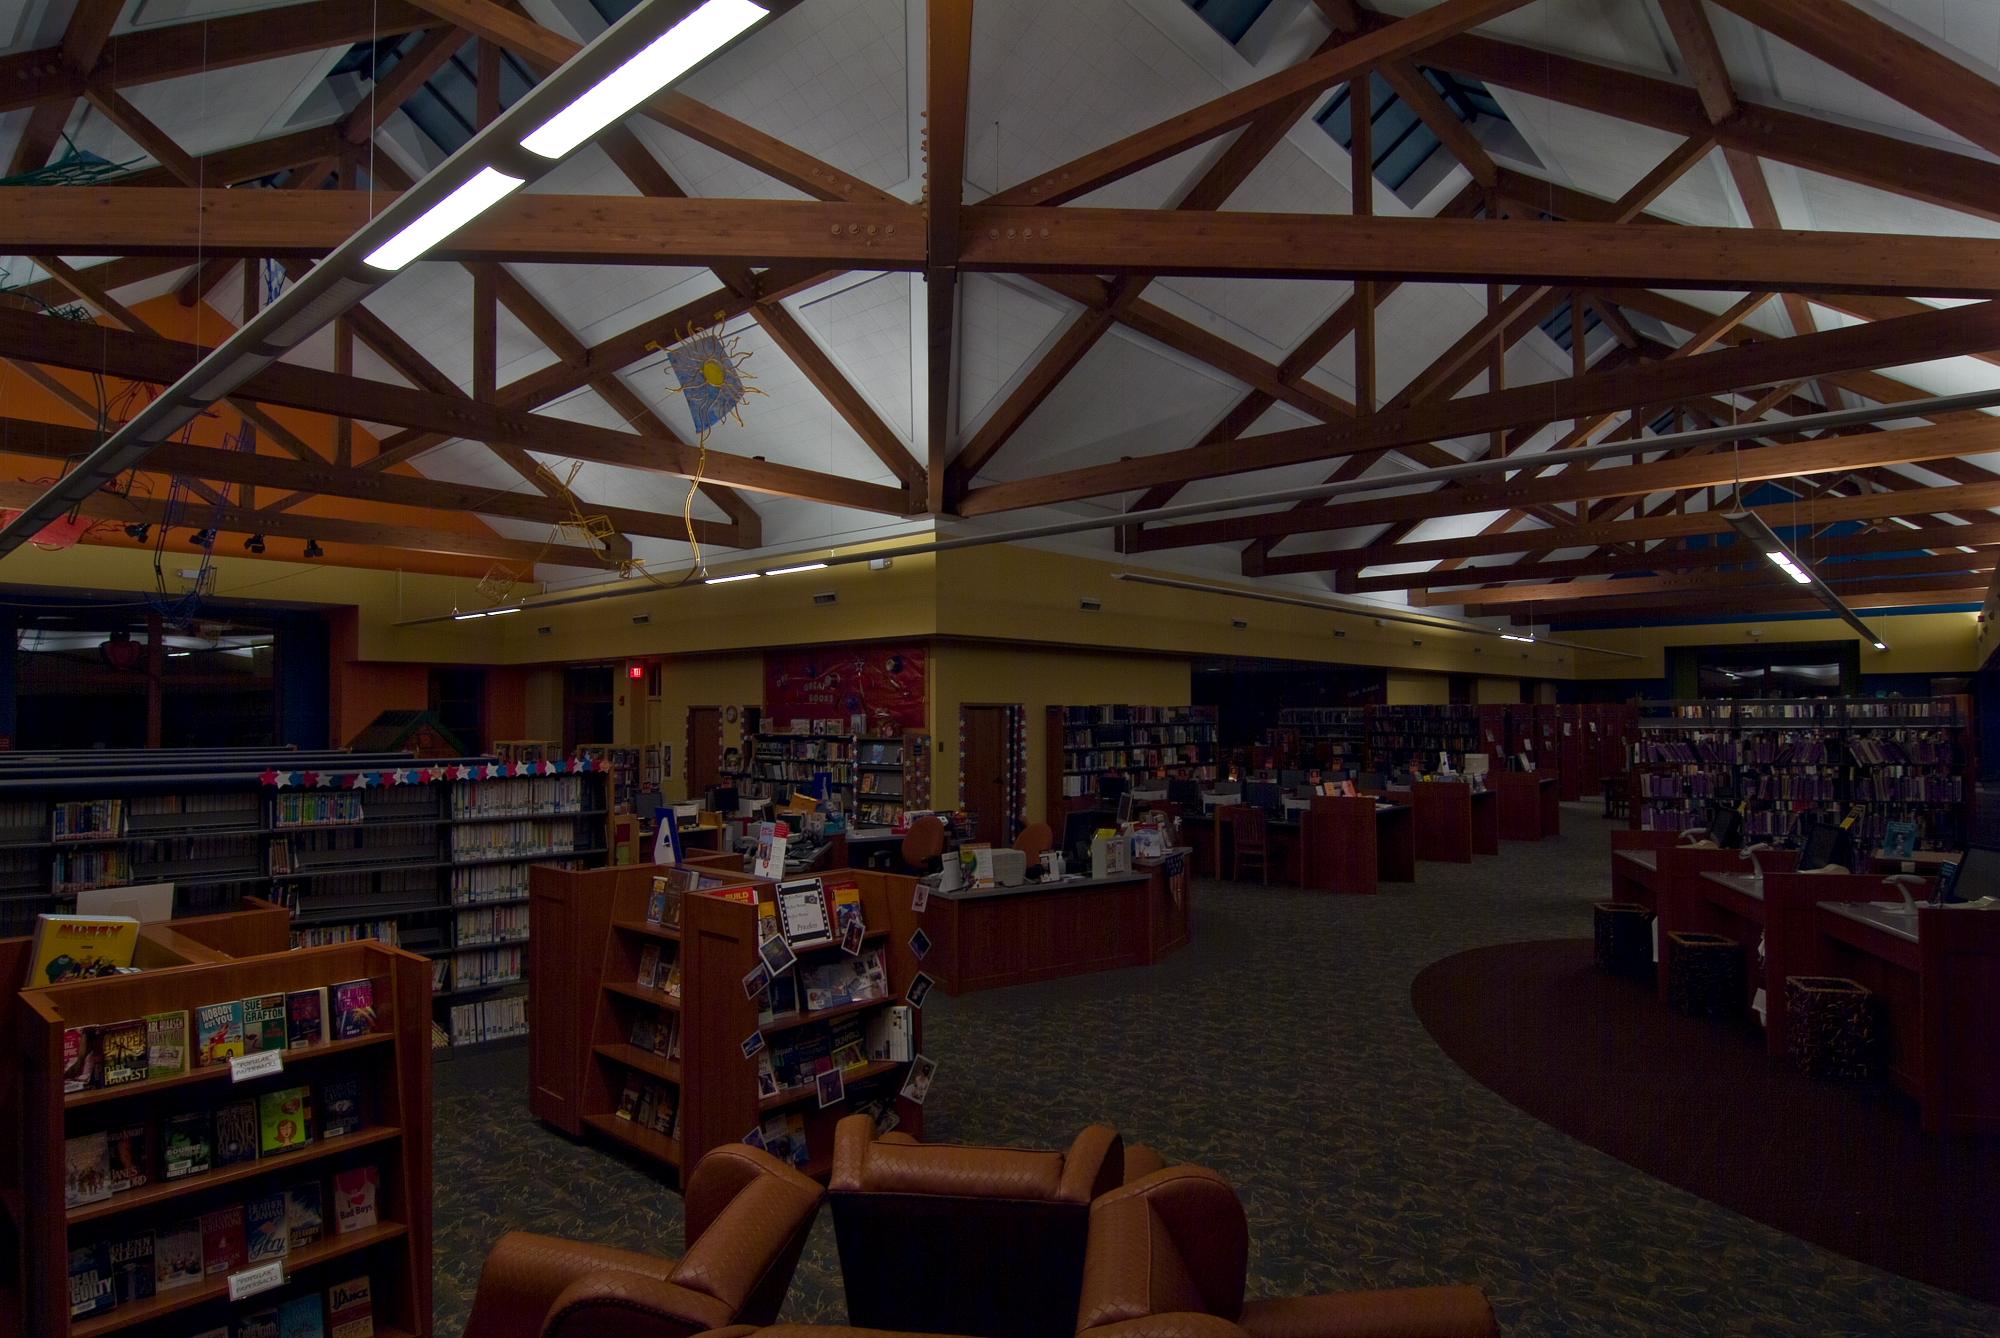 Brecksville_Public Library11.JPG